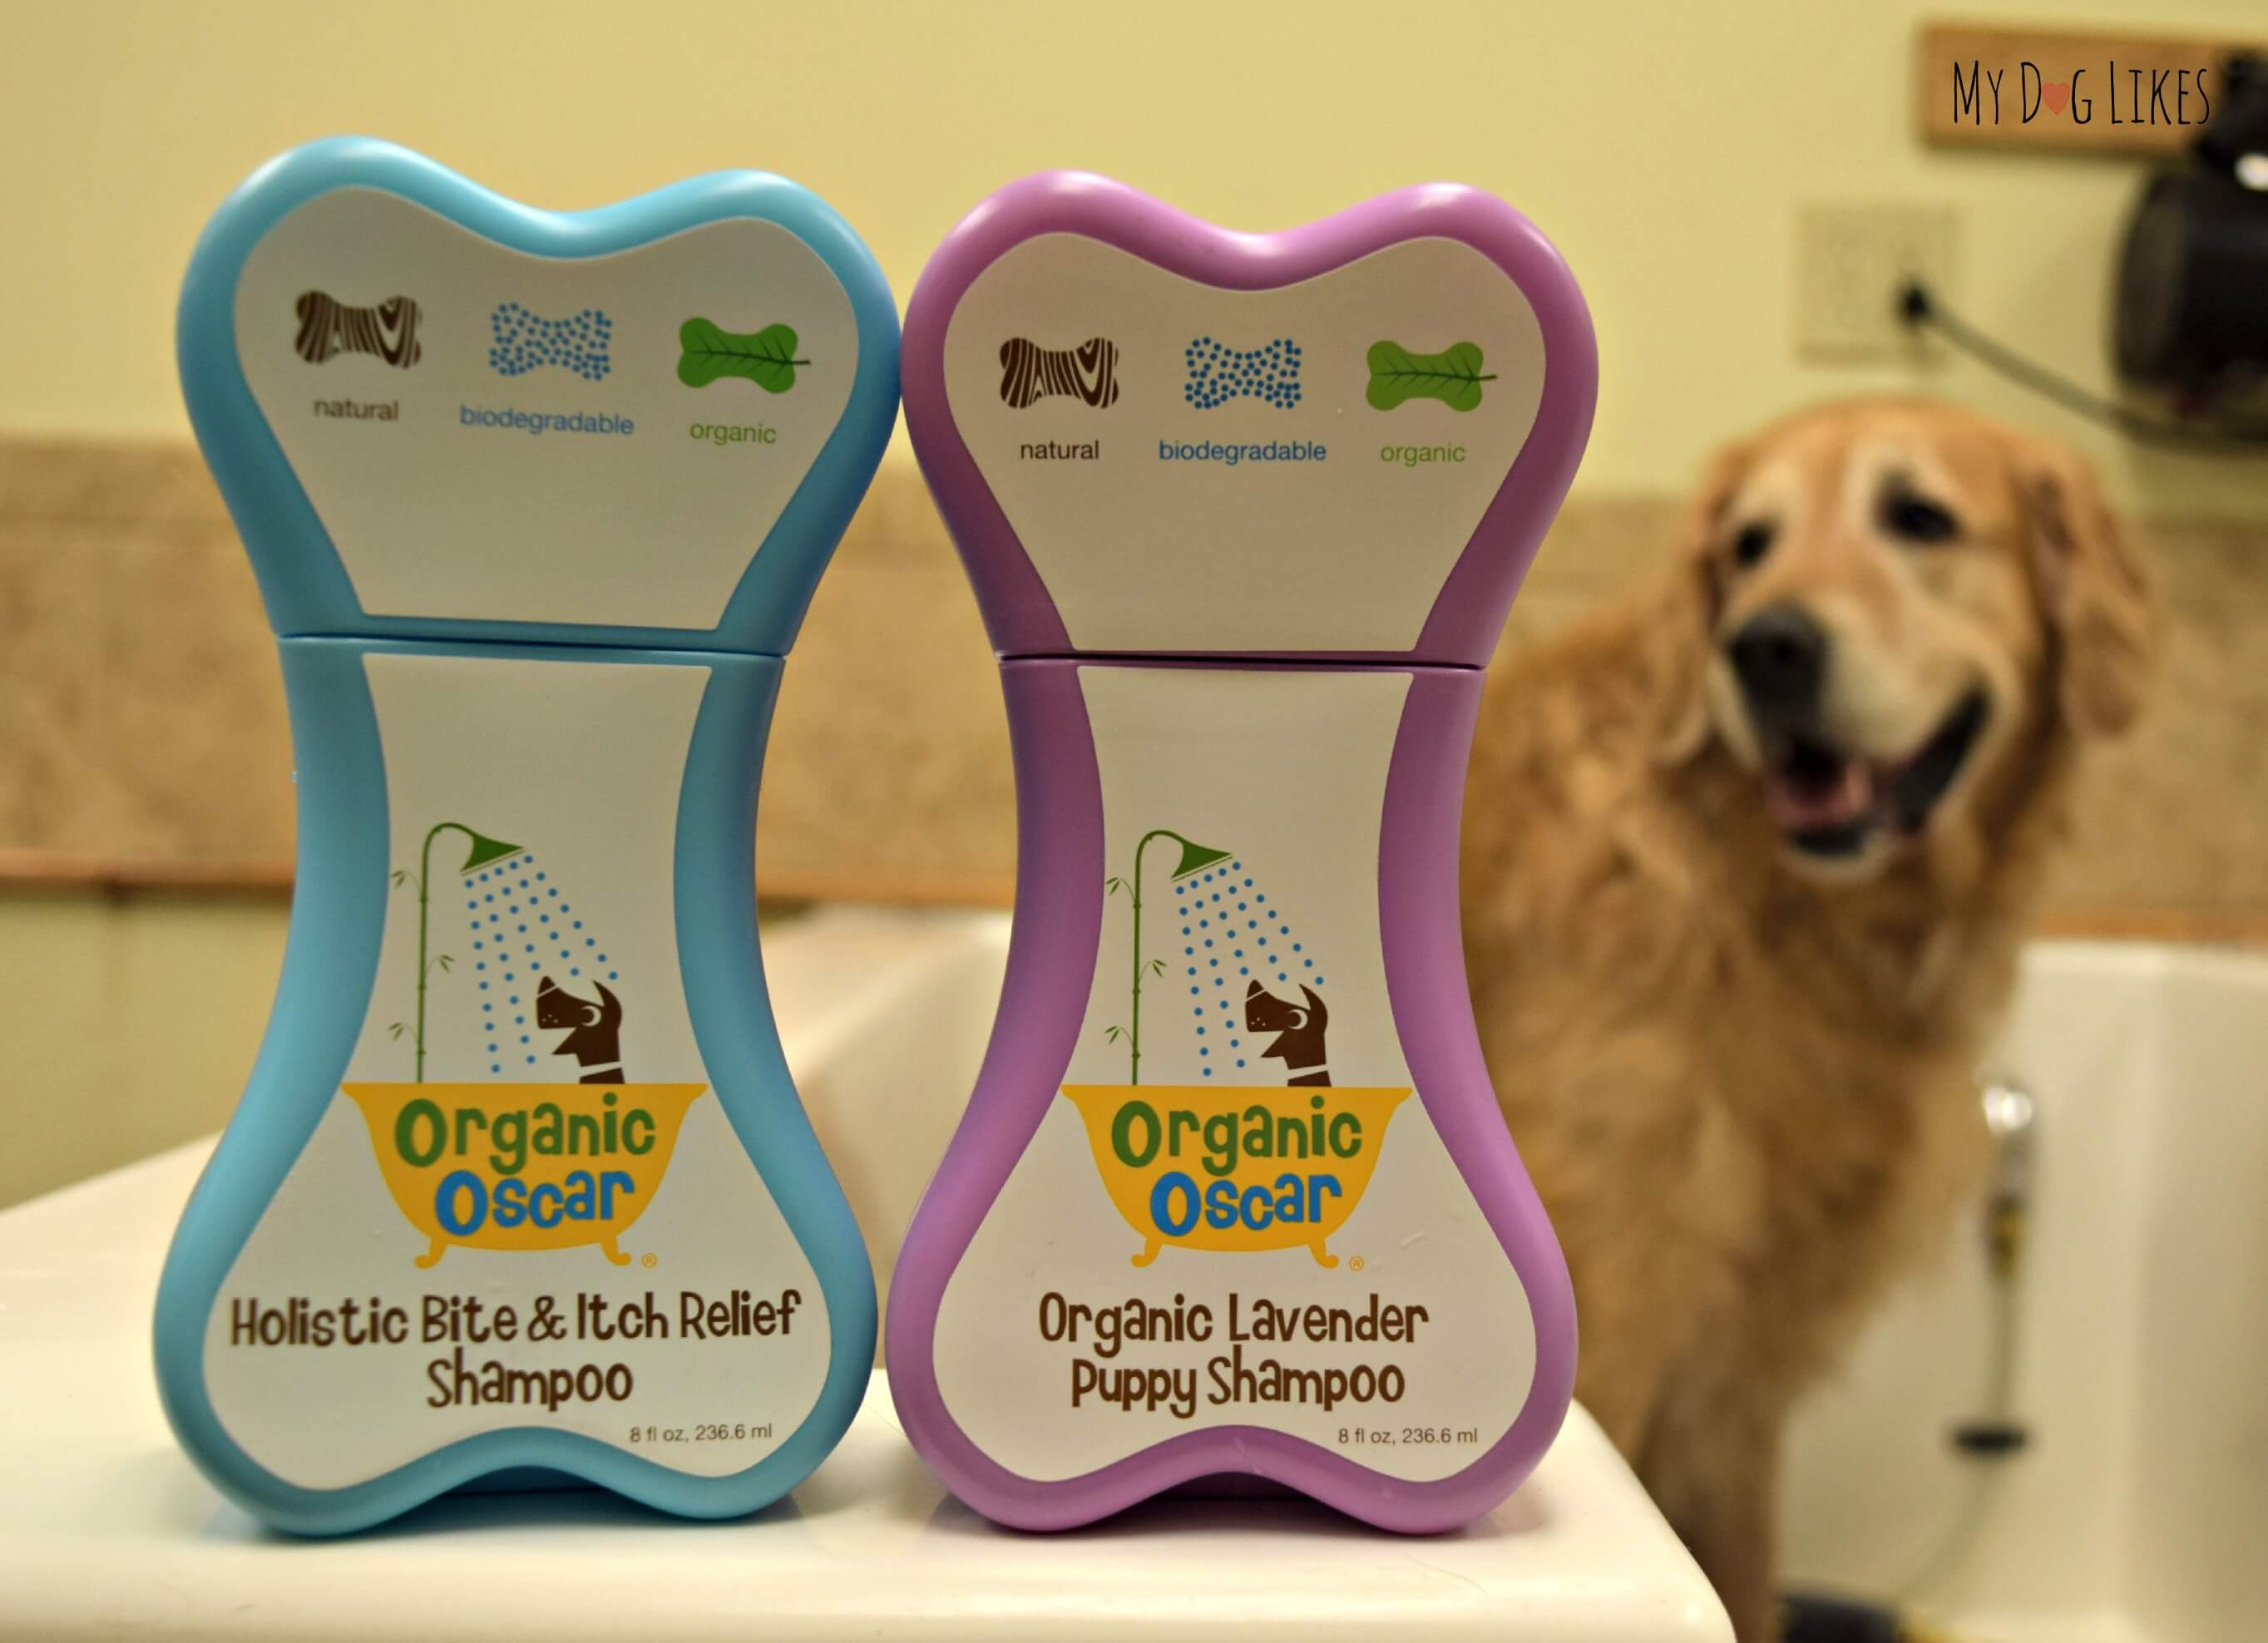 How to bathe a dog a step by step guide mydoglikes reviews organic oscar dog shampoos solutioingenieria Choice Image